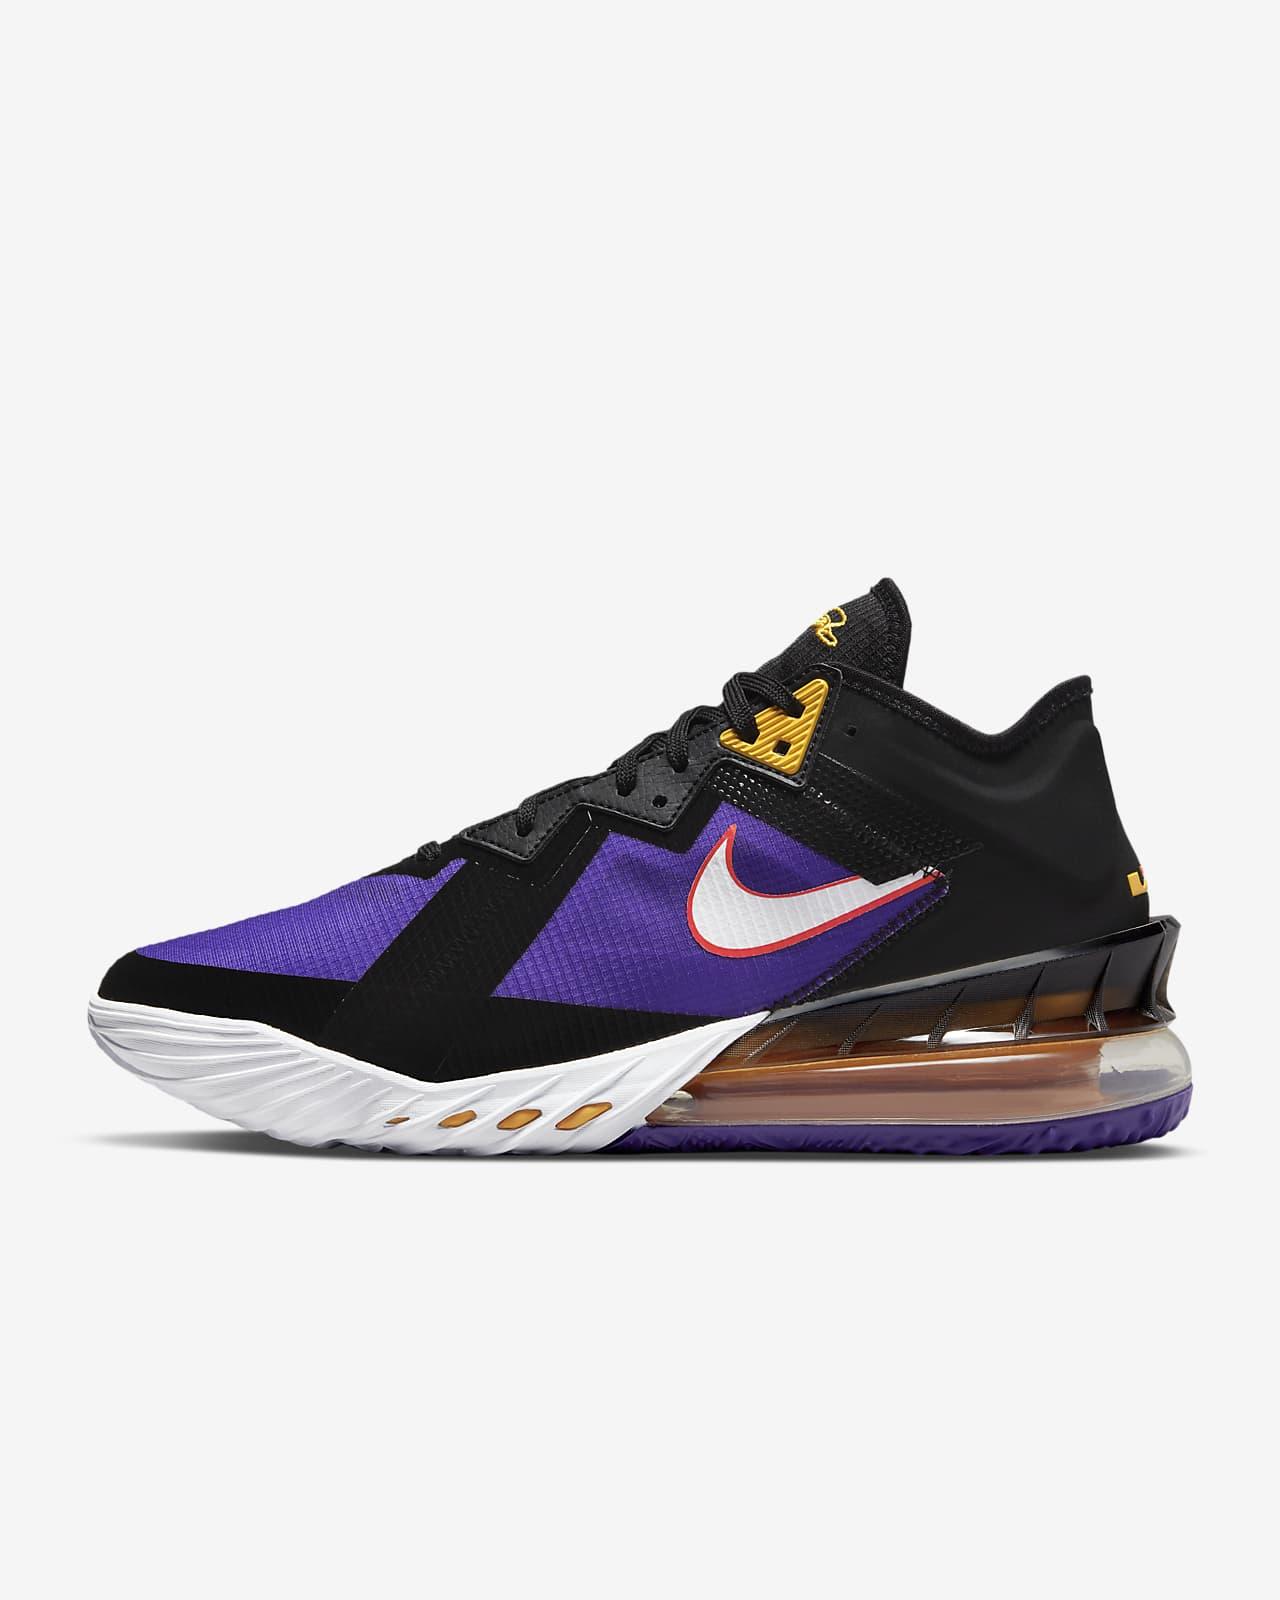 LeBron 18 Low Basketball Shoe